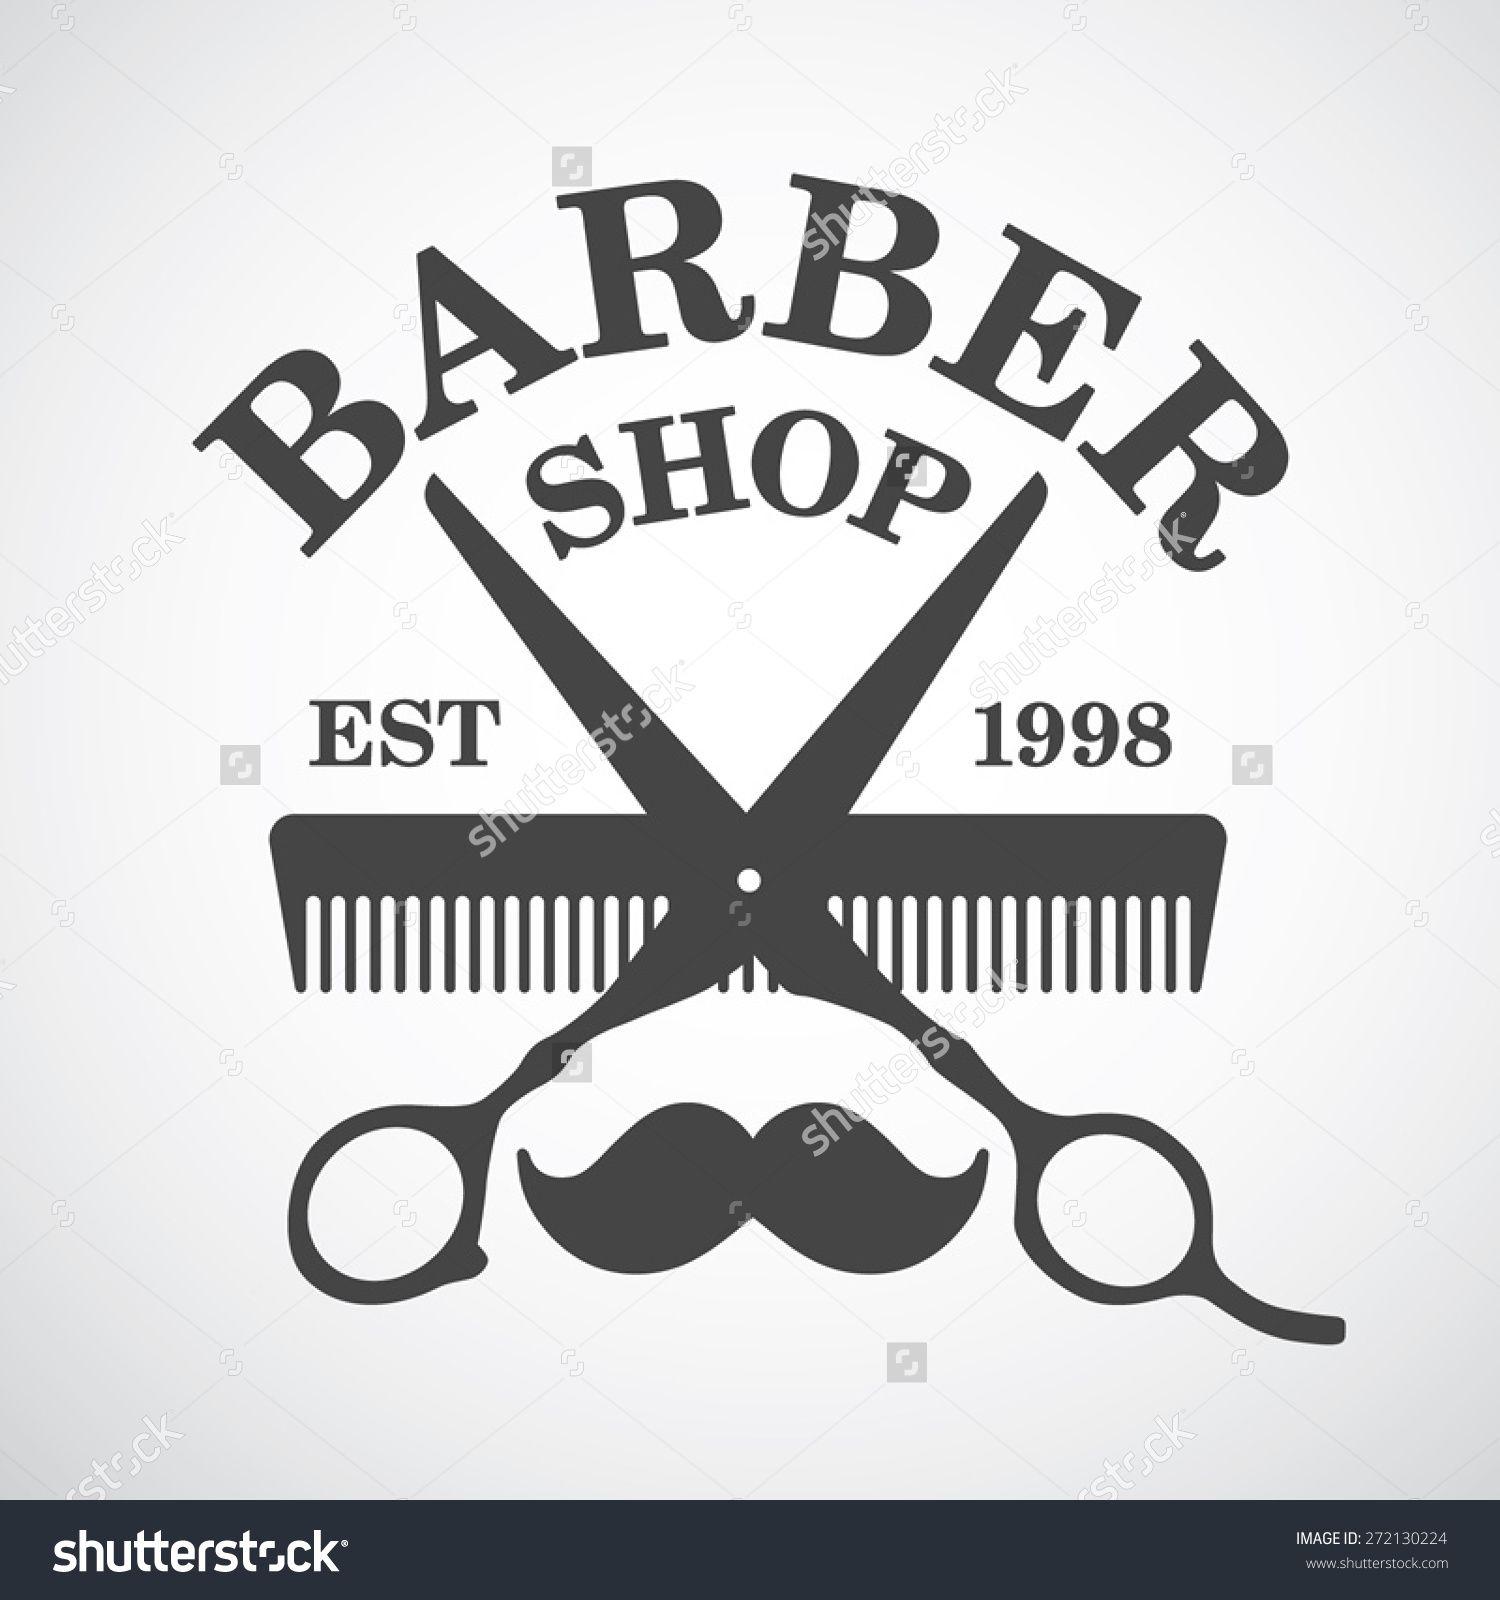 Clip art vector of vintage barber shop logo graphics and icon vector - Vintage Barber Shop Logo Template Design Elements Buy This Stock Vector On Shutterstock Find Other Images